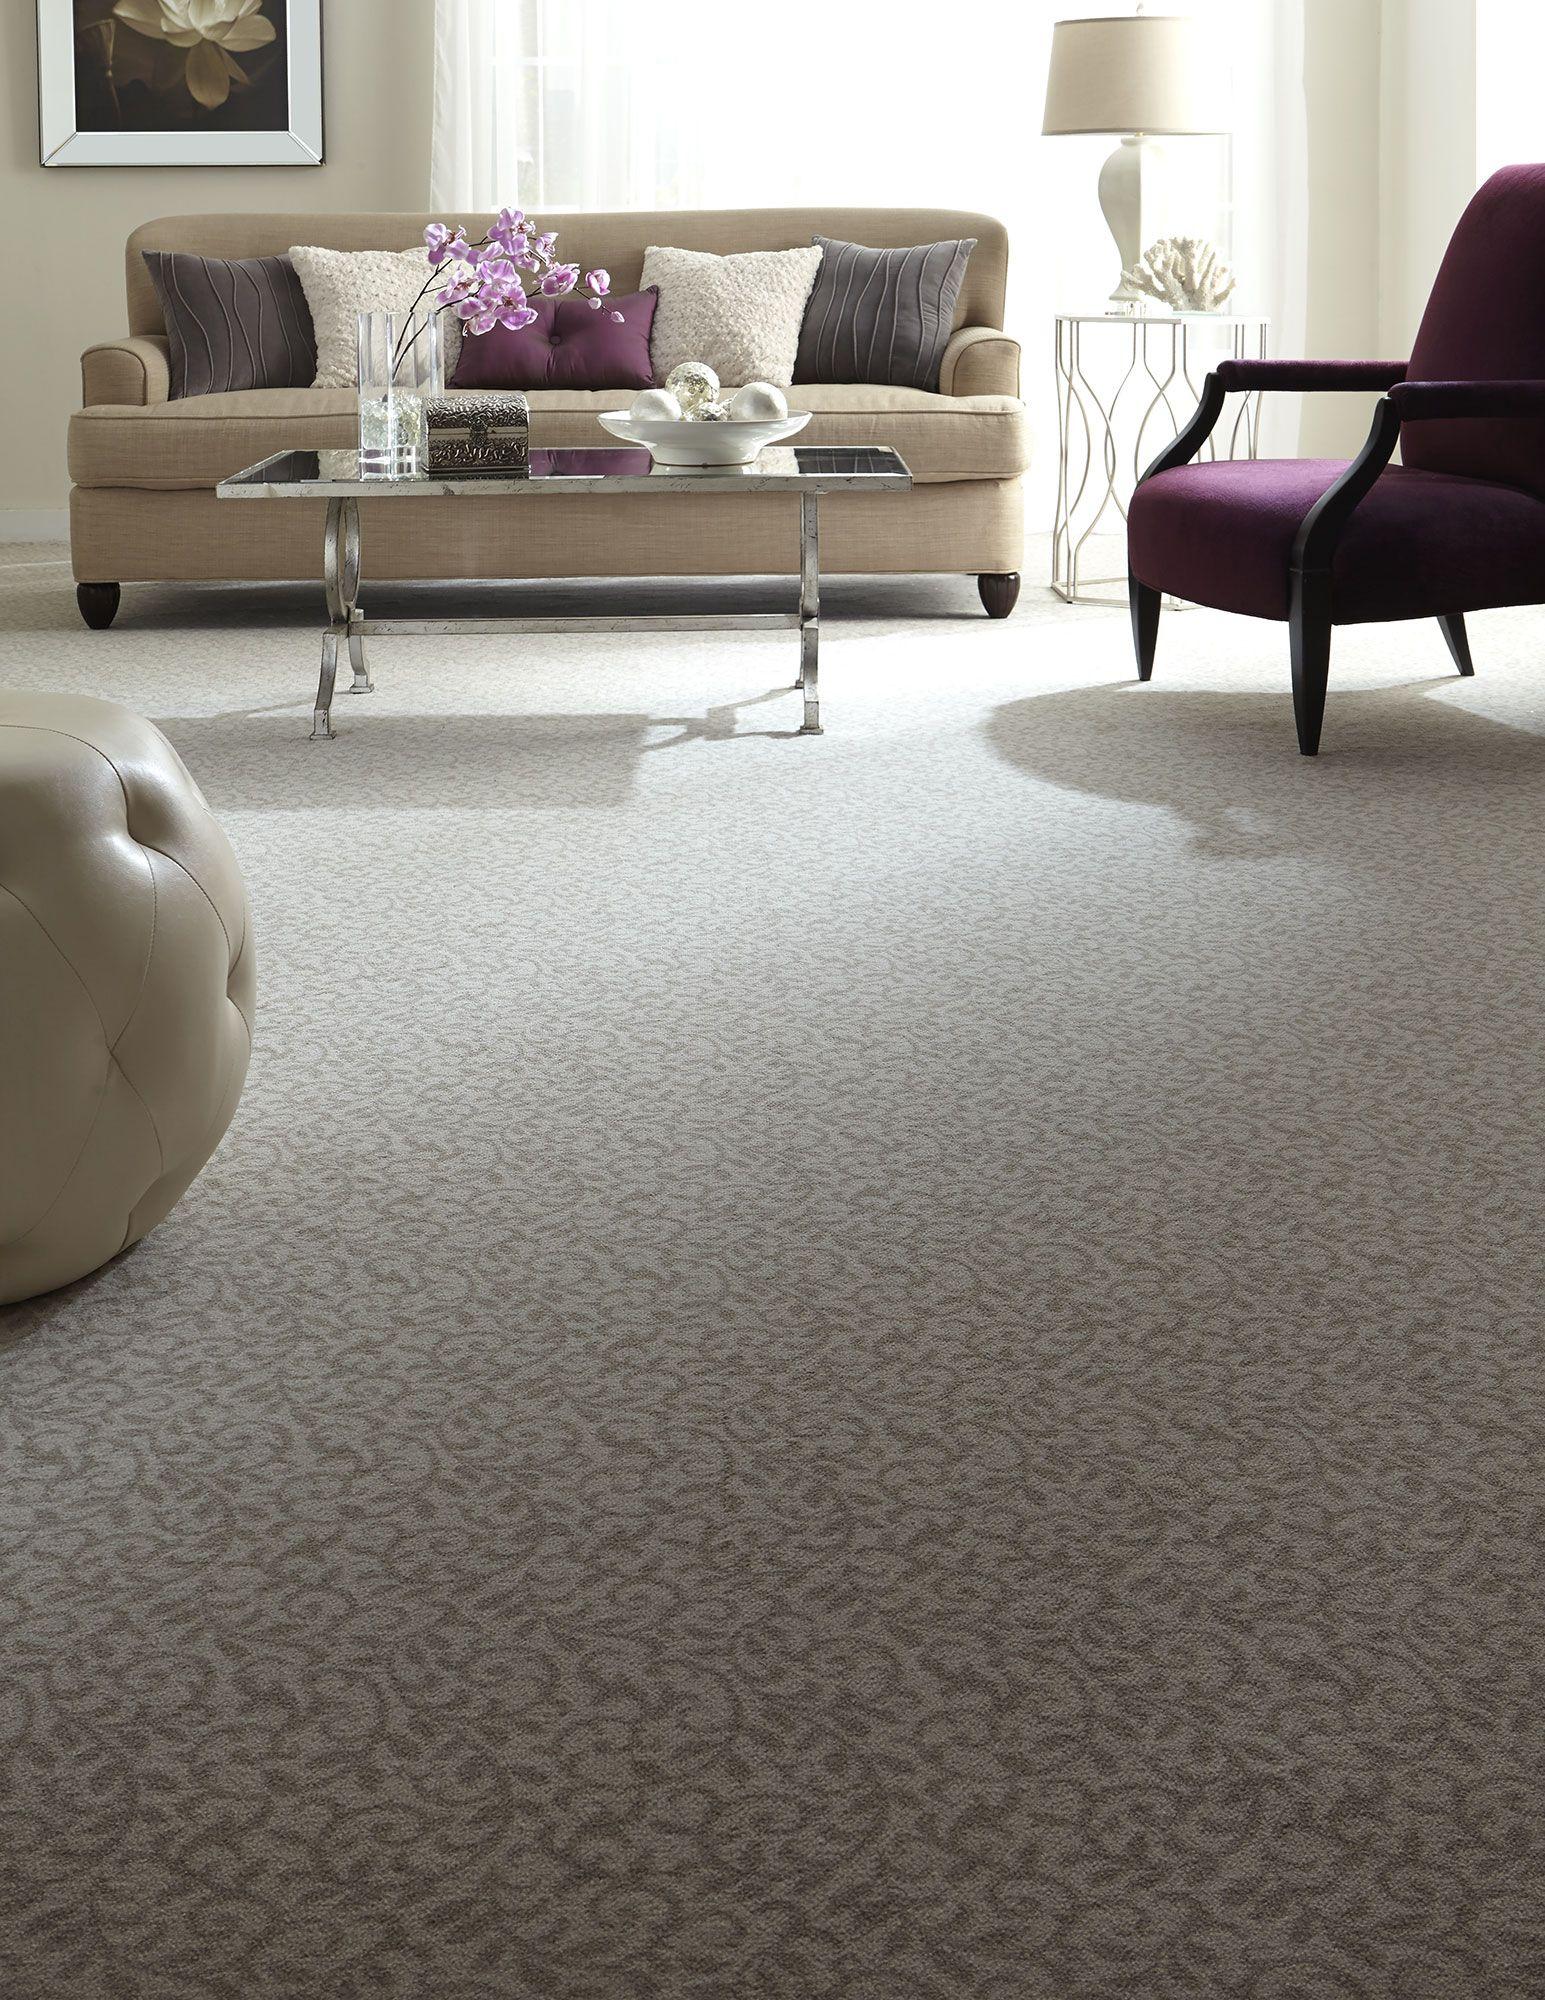 Vine Patterned Carpet Neutral Flooring Living Room Ideas